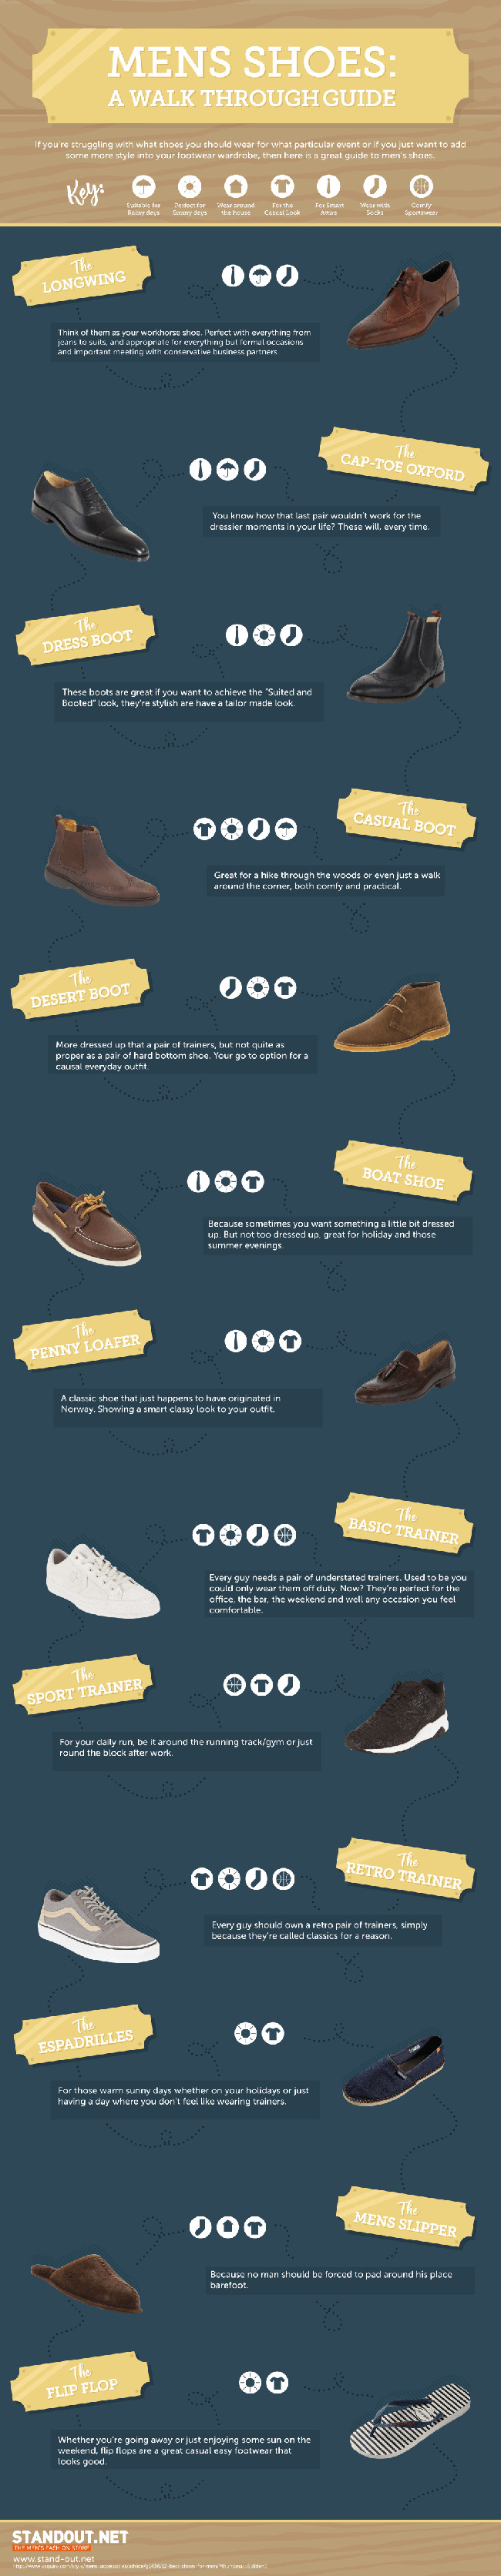 The Ultimate Men's Dress Shoe Guide